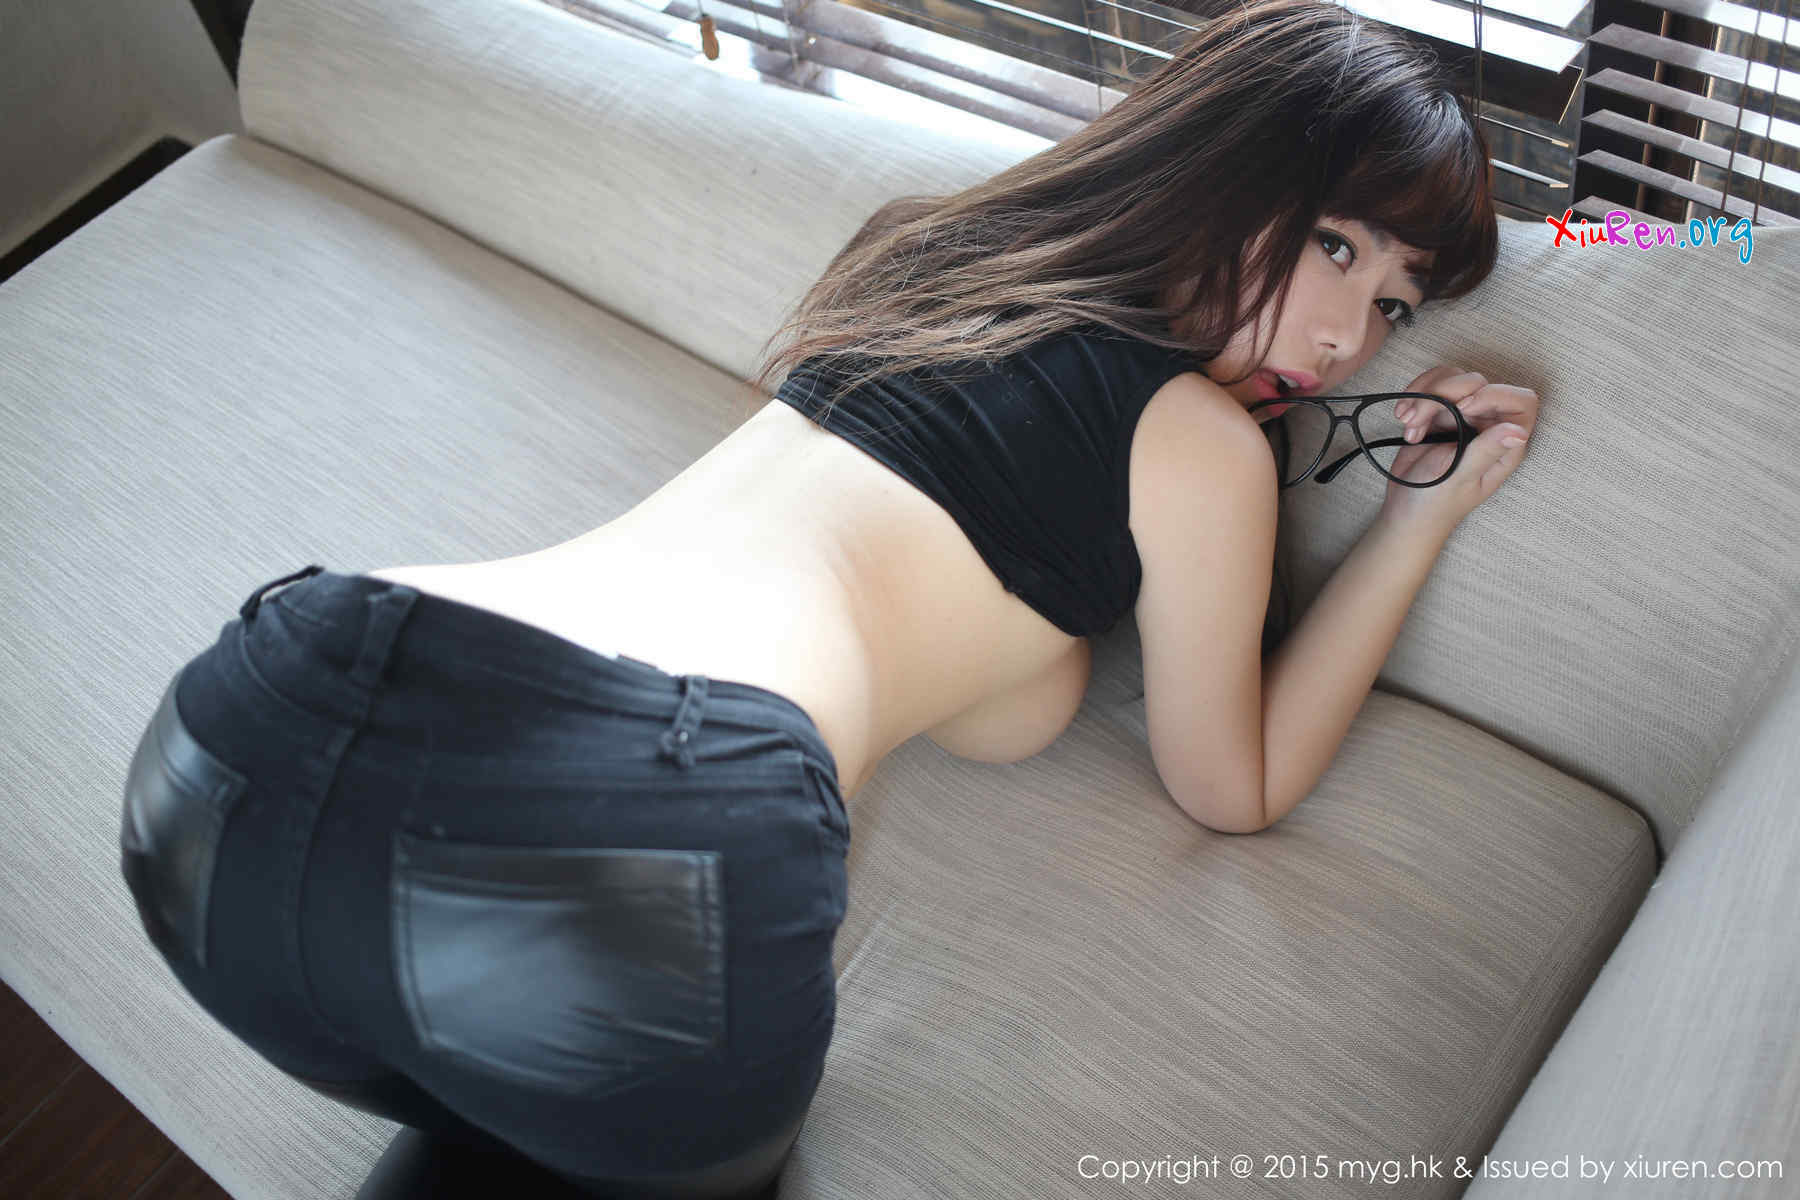 PhimVu-Blog-0065.jpg